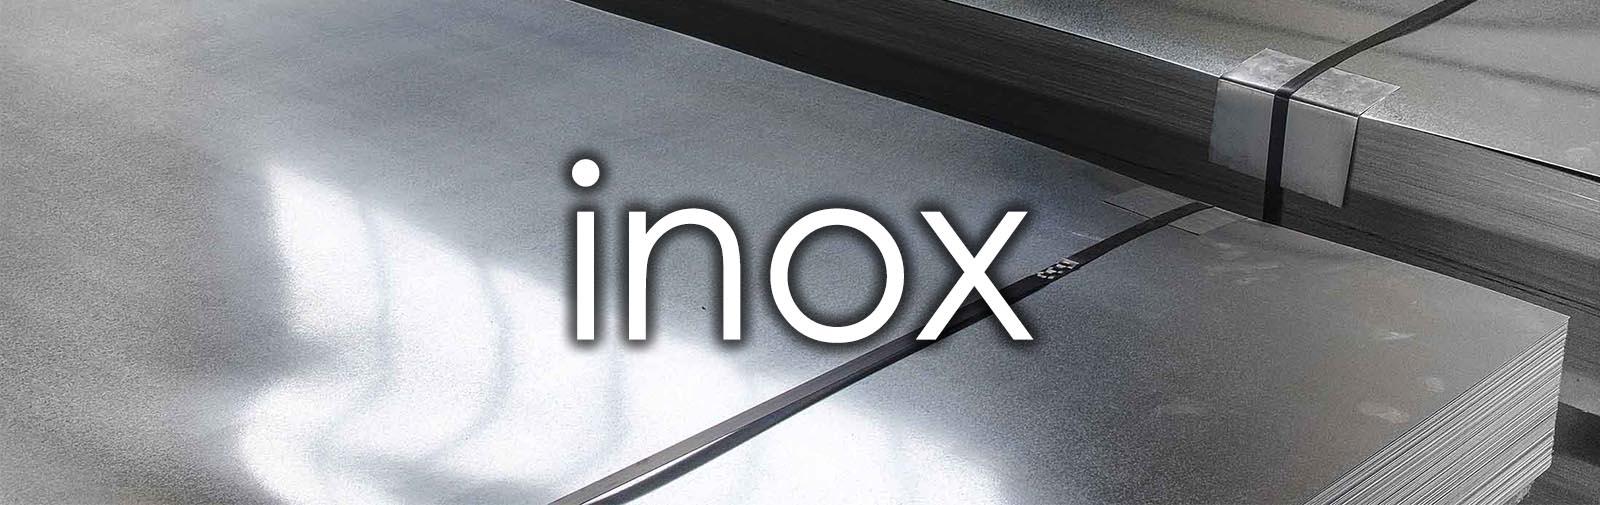 barre-tubi-acciaio-inox-aisi-304